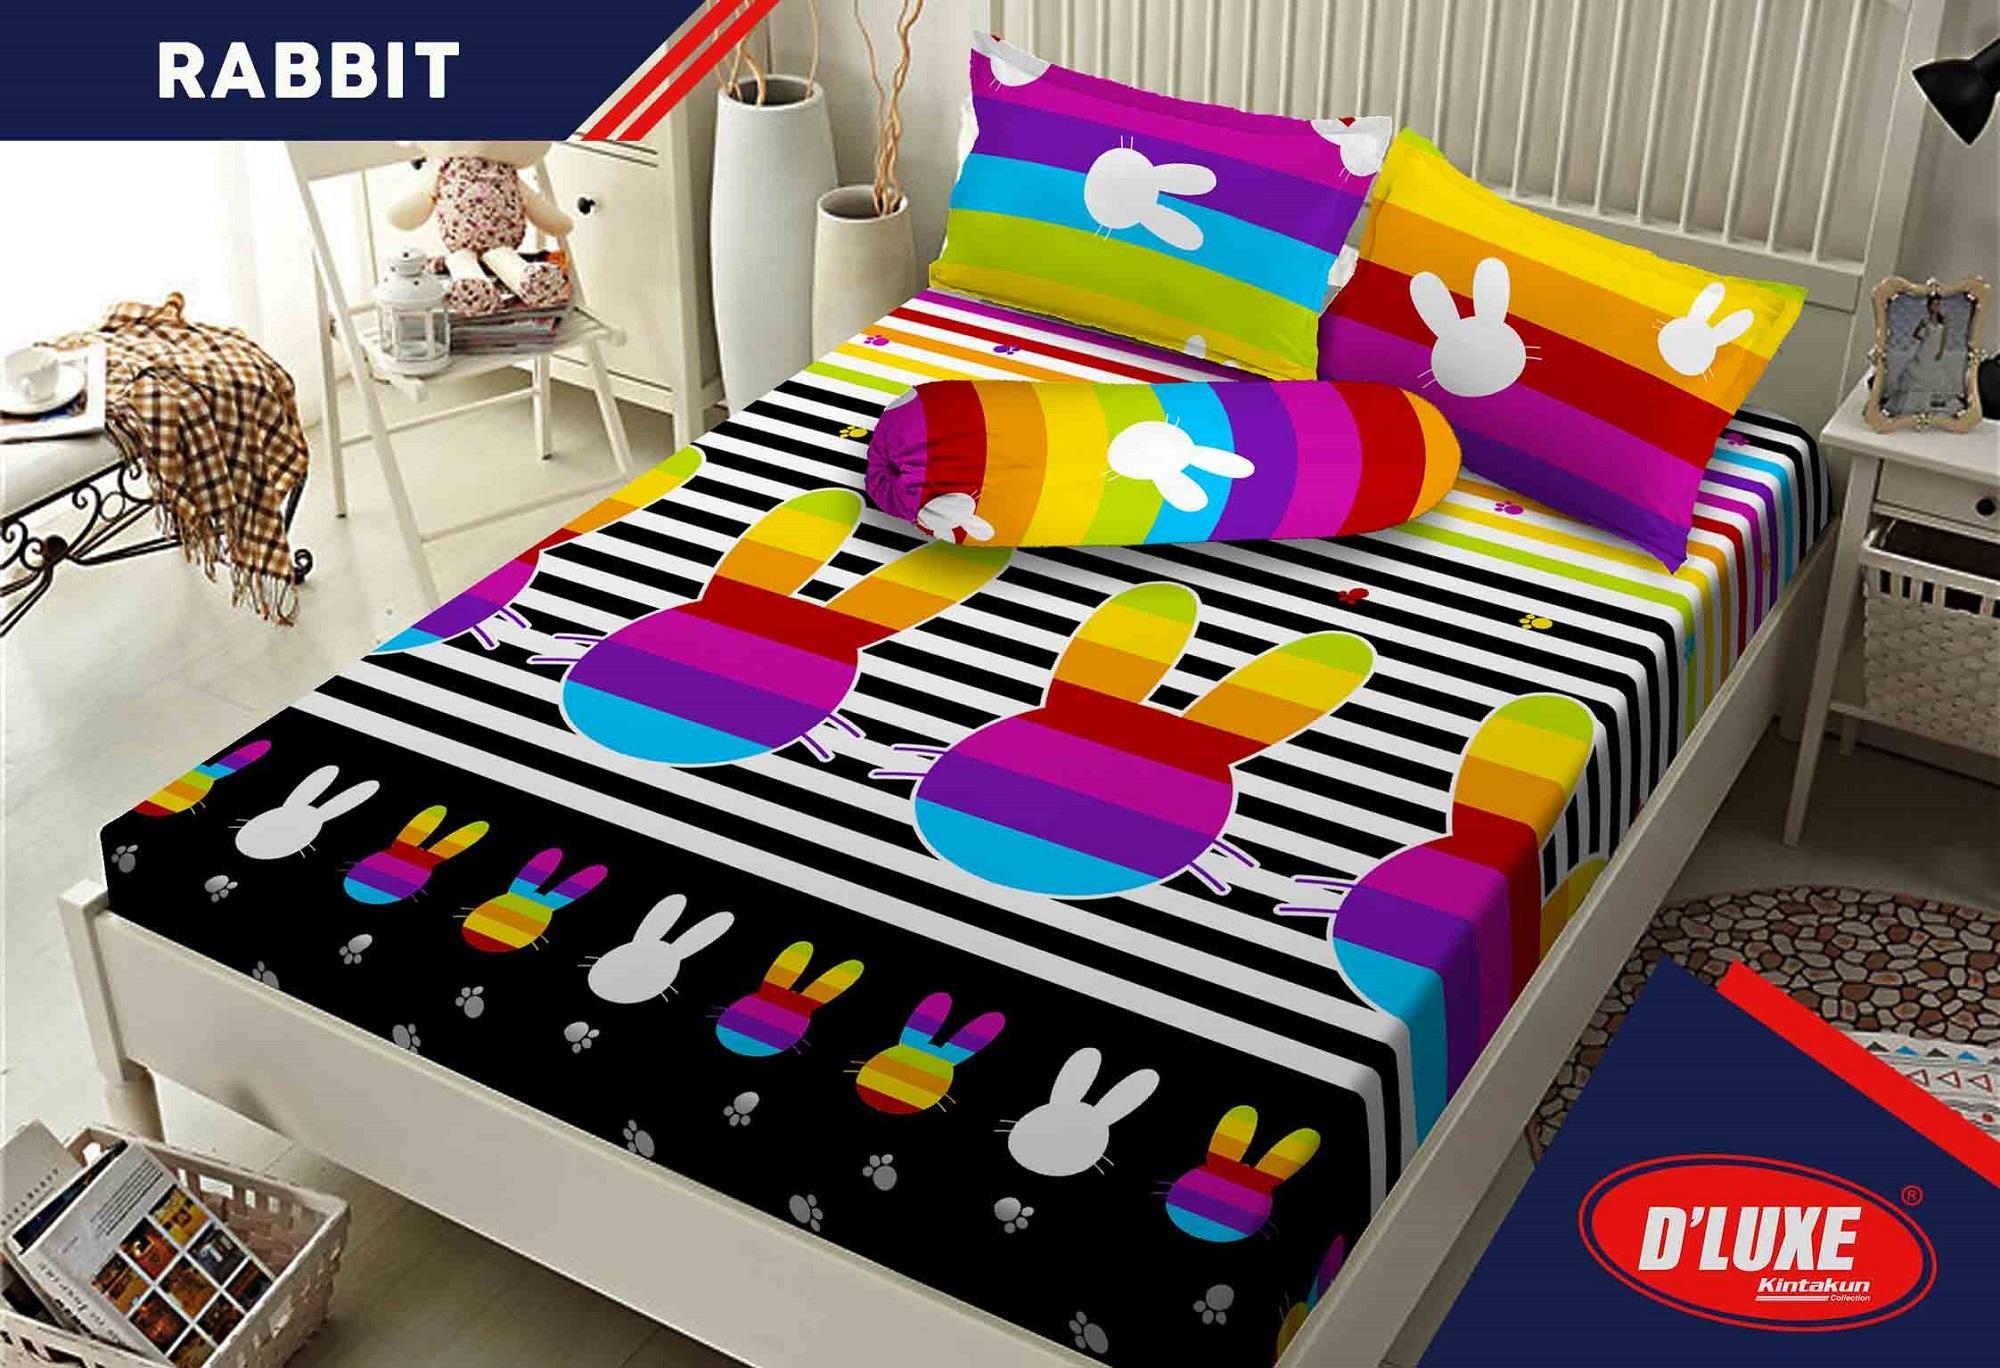 Bed Set Peralatan Ranjang Terbaik Sprei Katun Import  Uk 120x200 Single 452 Kintakun Kids Edition Cm New Rabbit